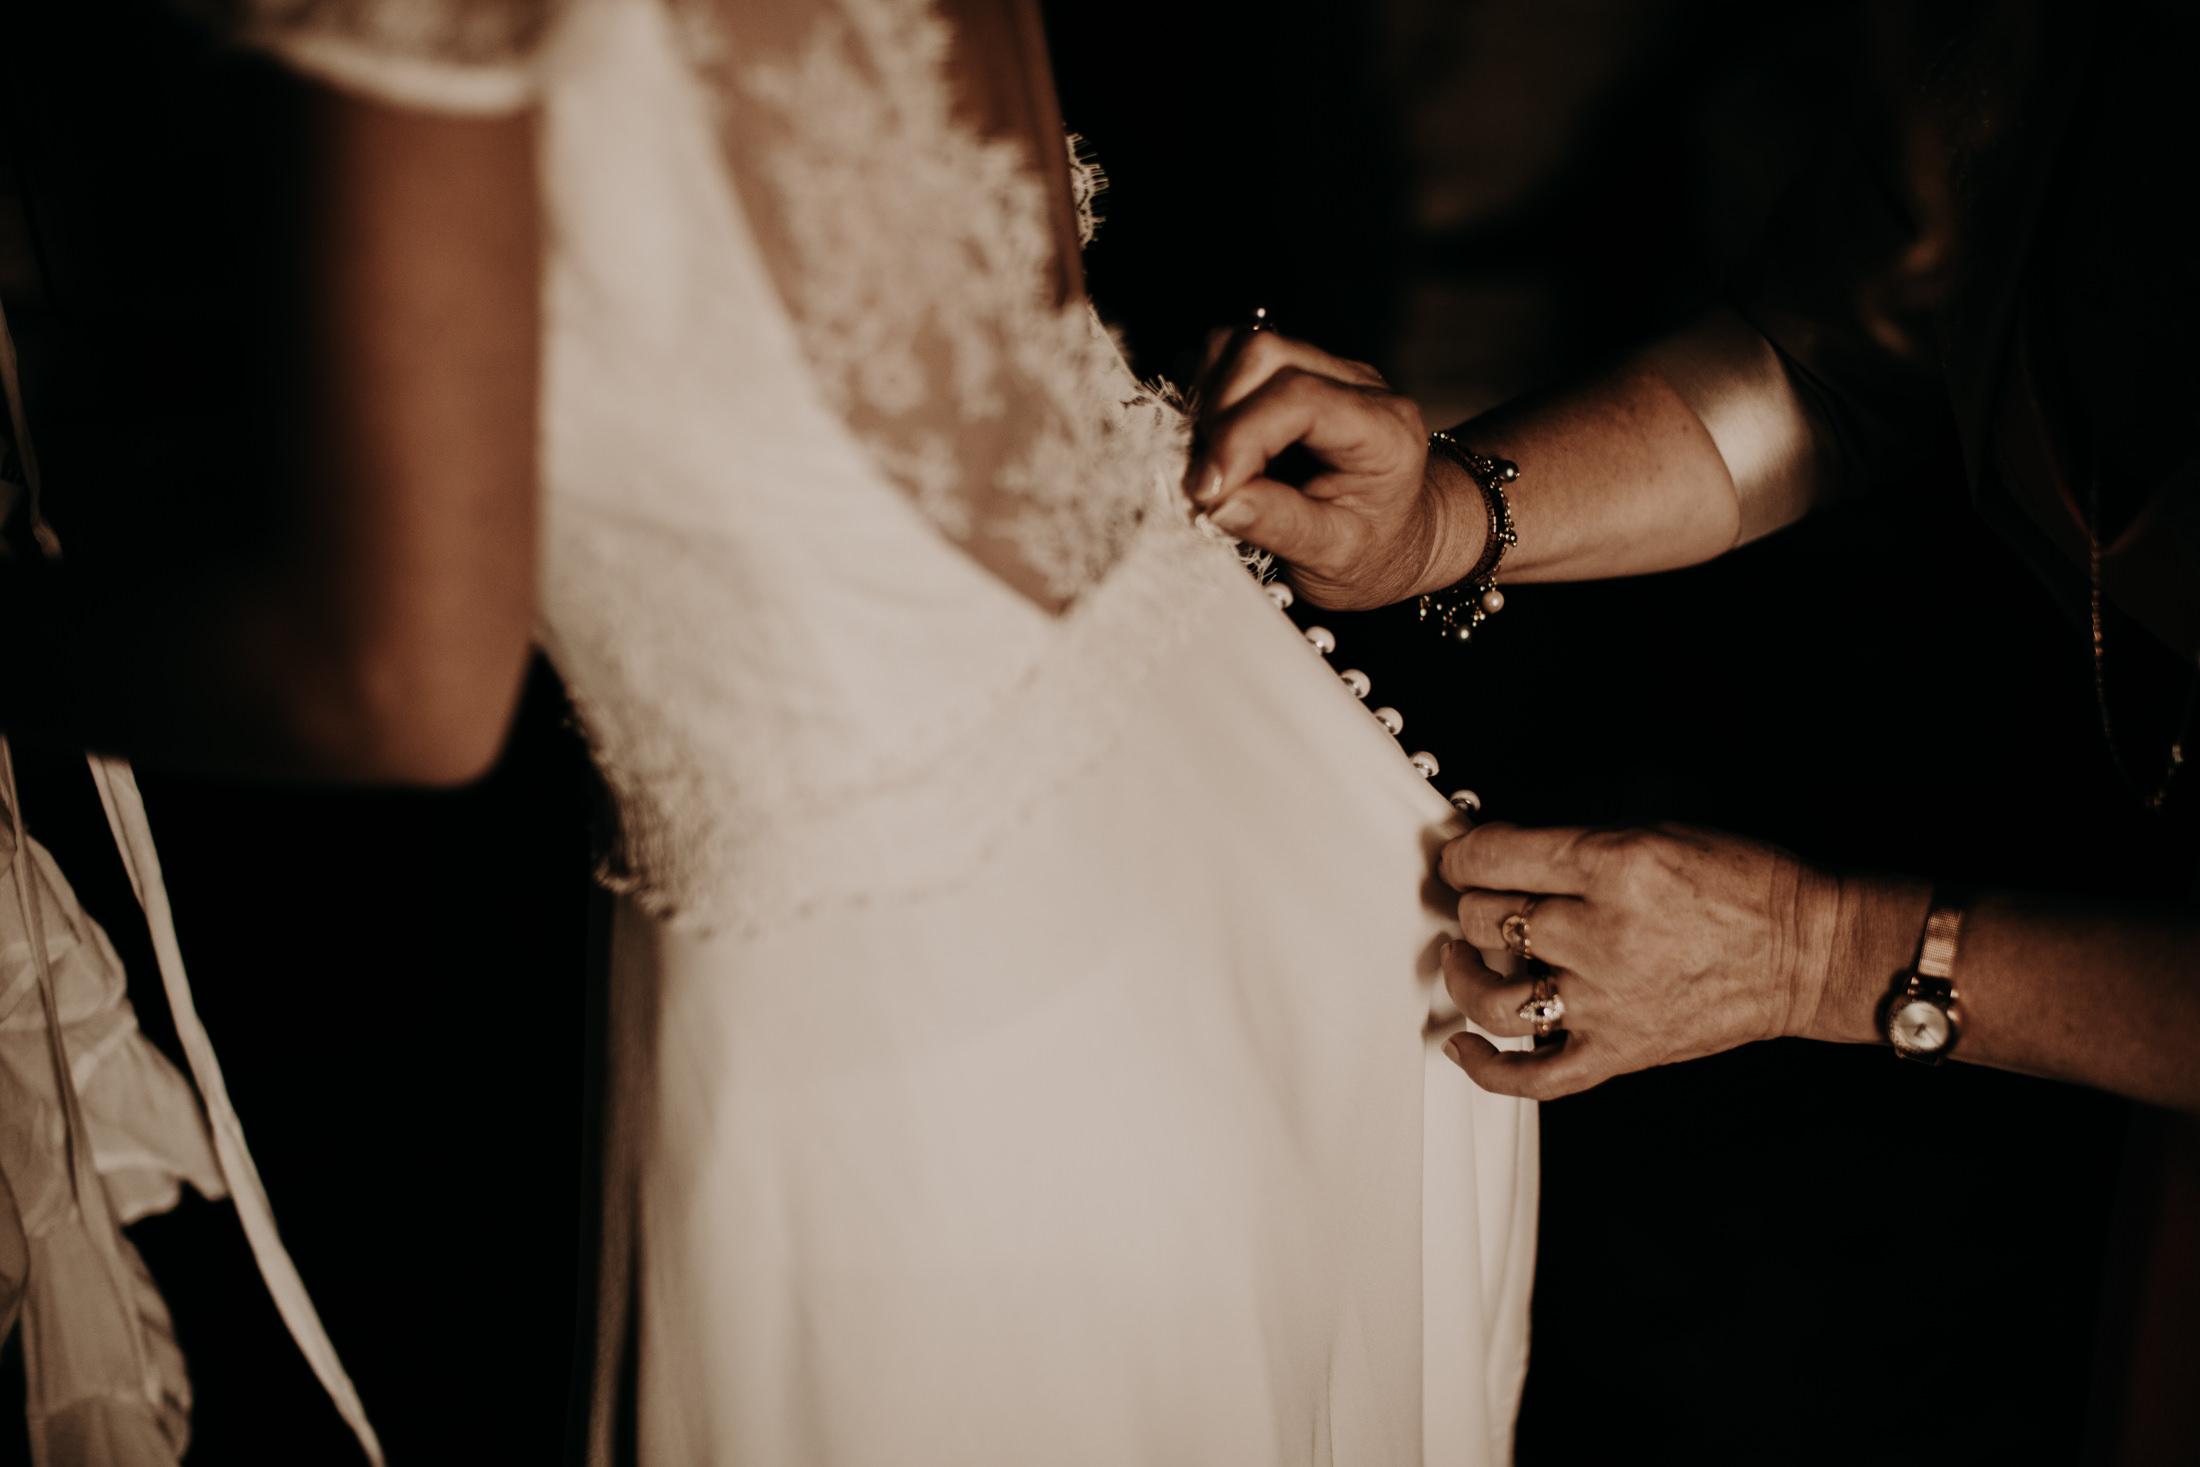 Mariage auvergne photographe wedding_-12.jpg